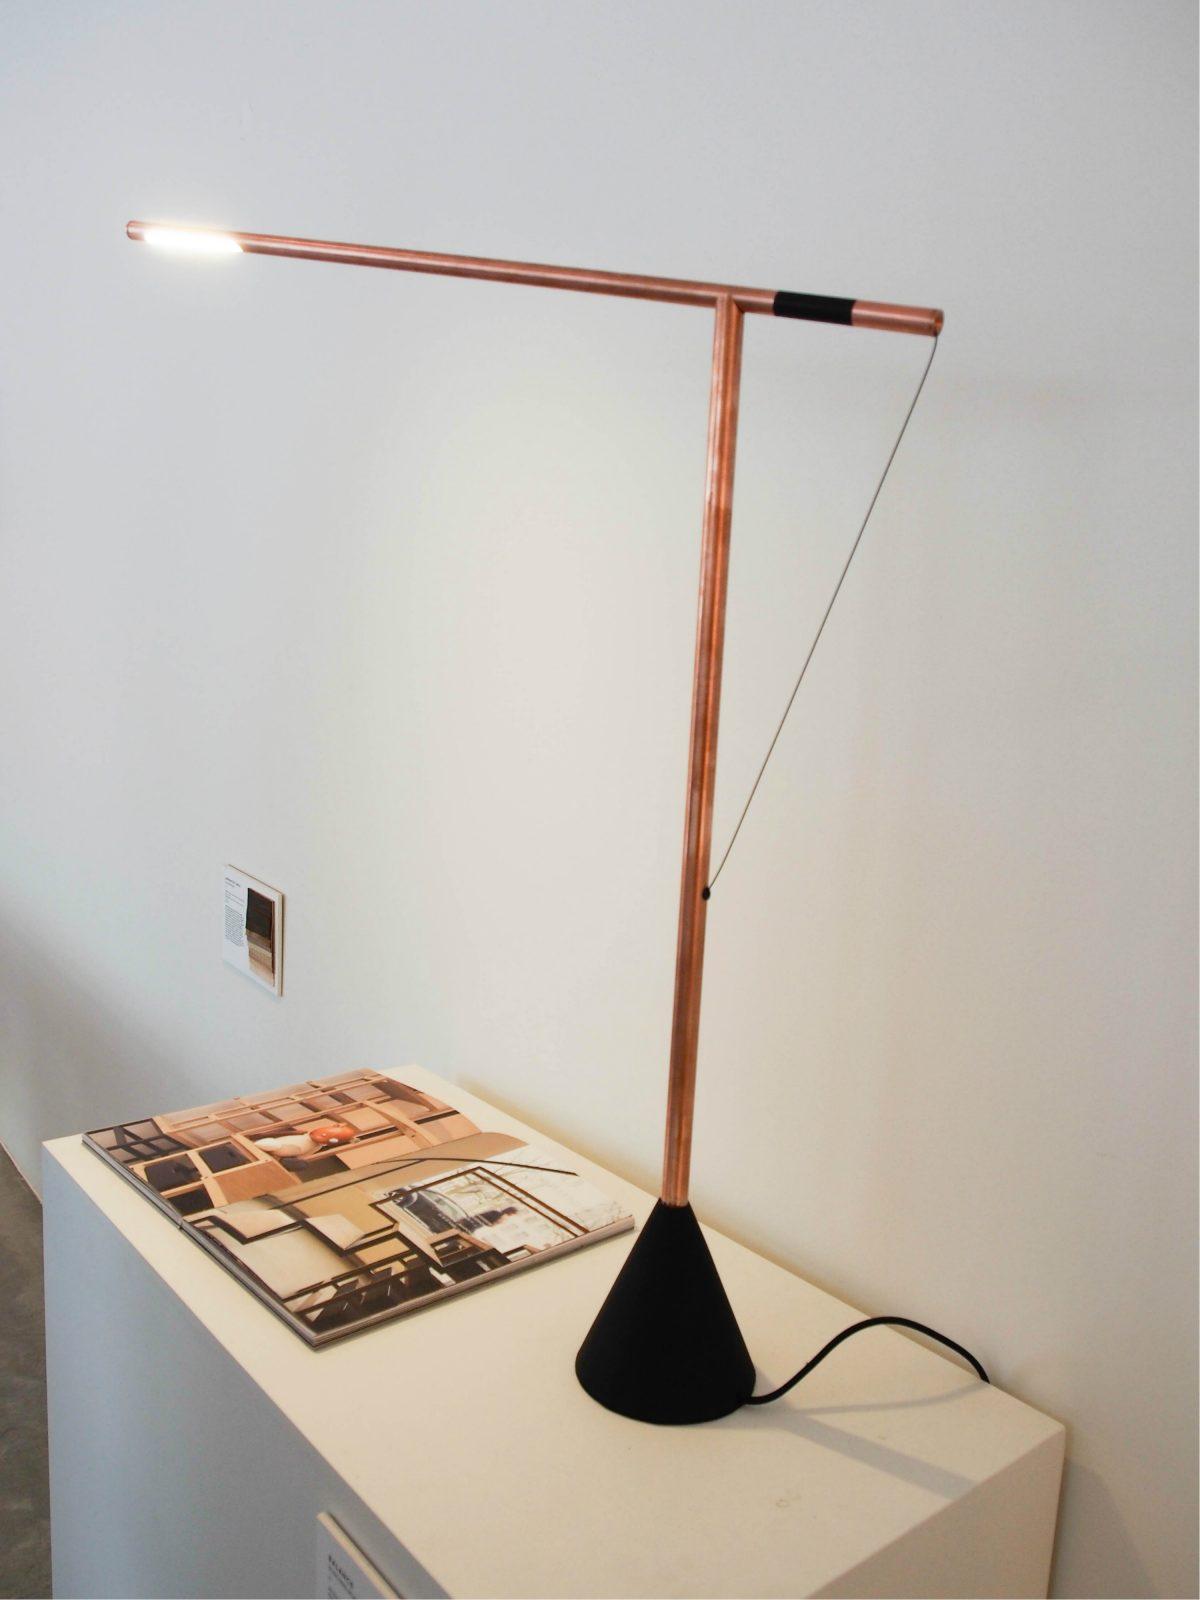 Studio Mieke Meijer Balance Copper lamp